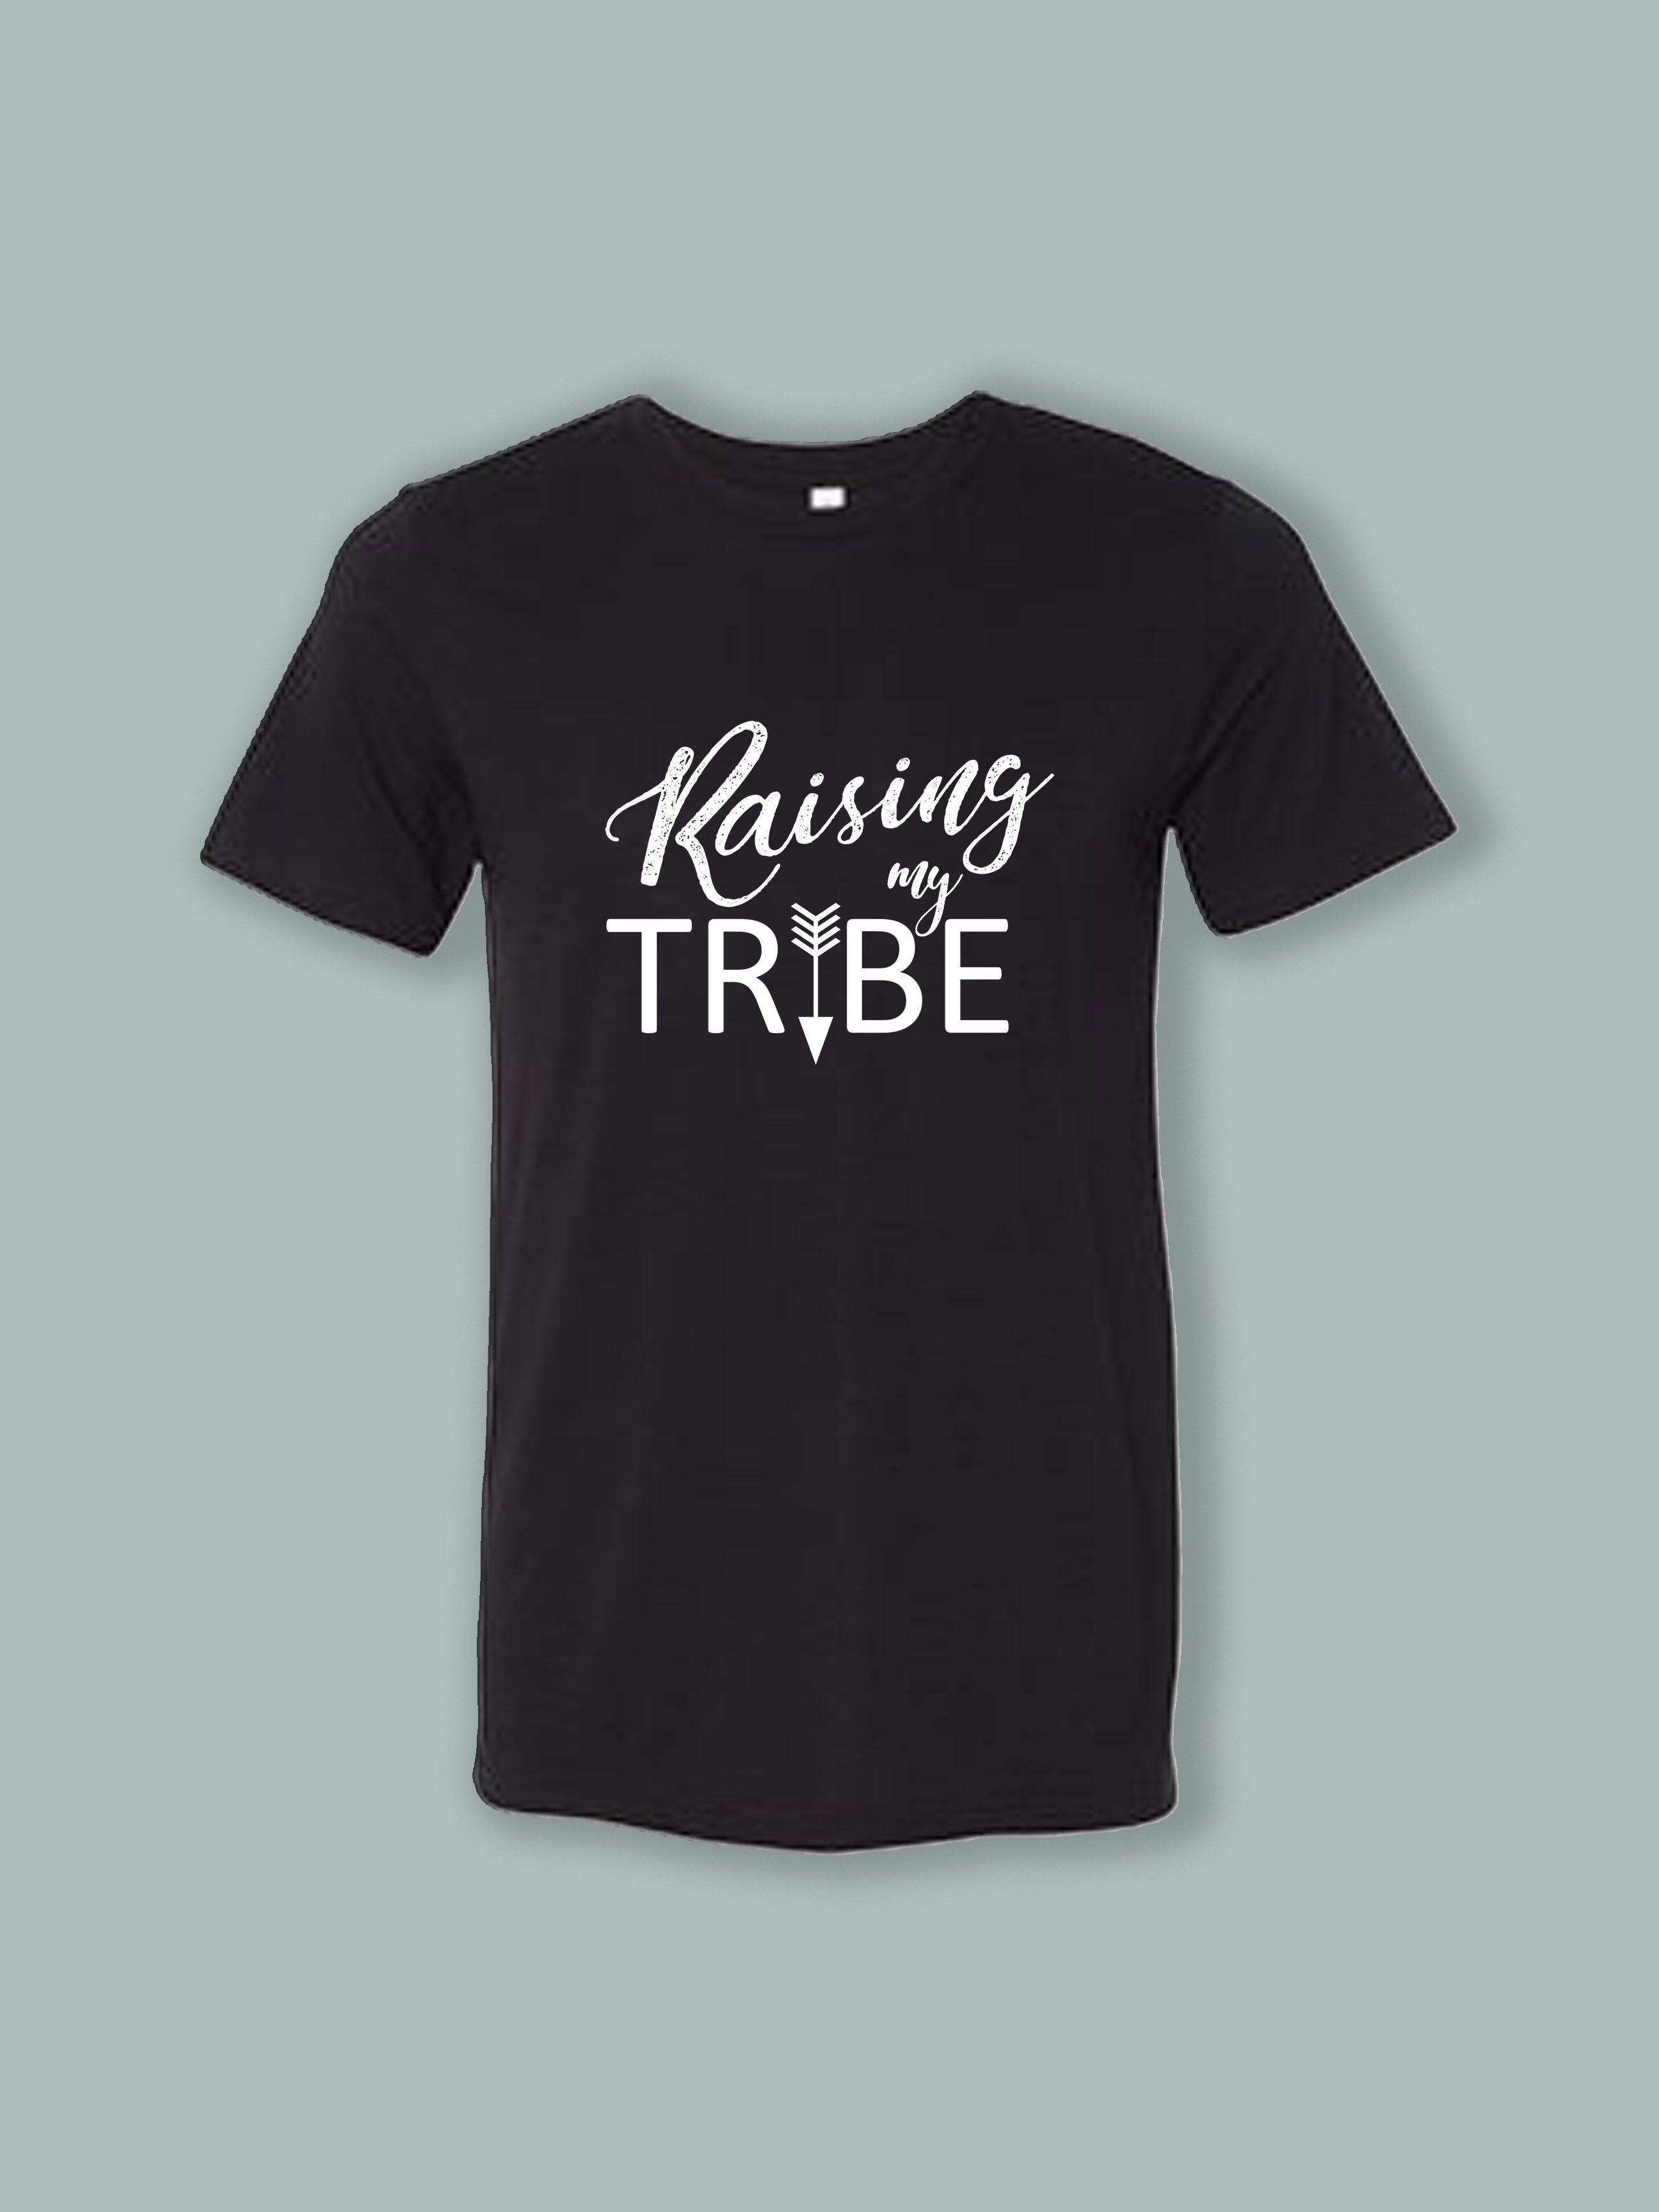 3afcaac83 T-Shirt (Raising My Tribe), mother t-shirt, mom t-shirt designs, shirts for  mom